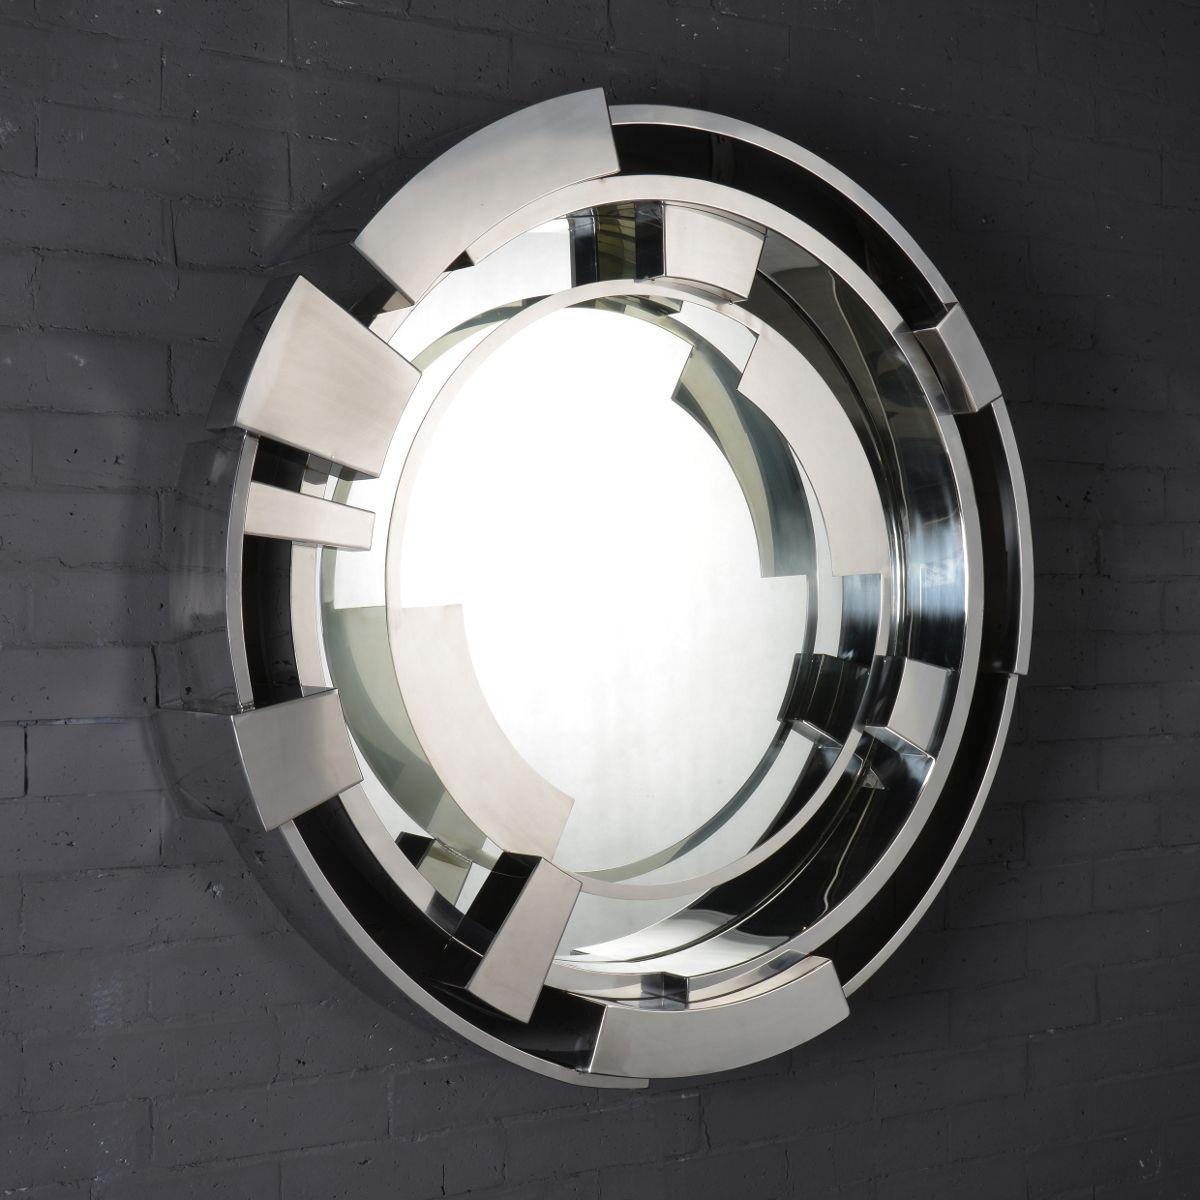 Зеркало VORTEX Коллекция Vortex by Michael Yeung Design | дизайн Michael Yeung